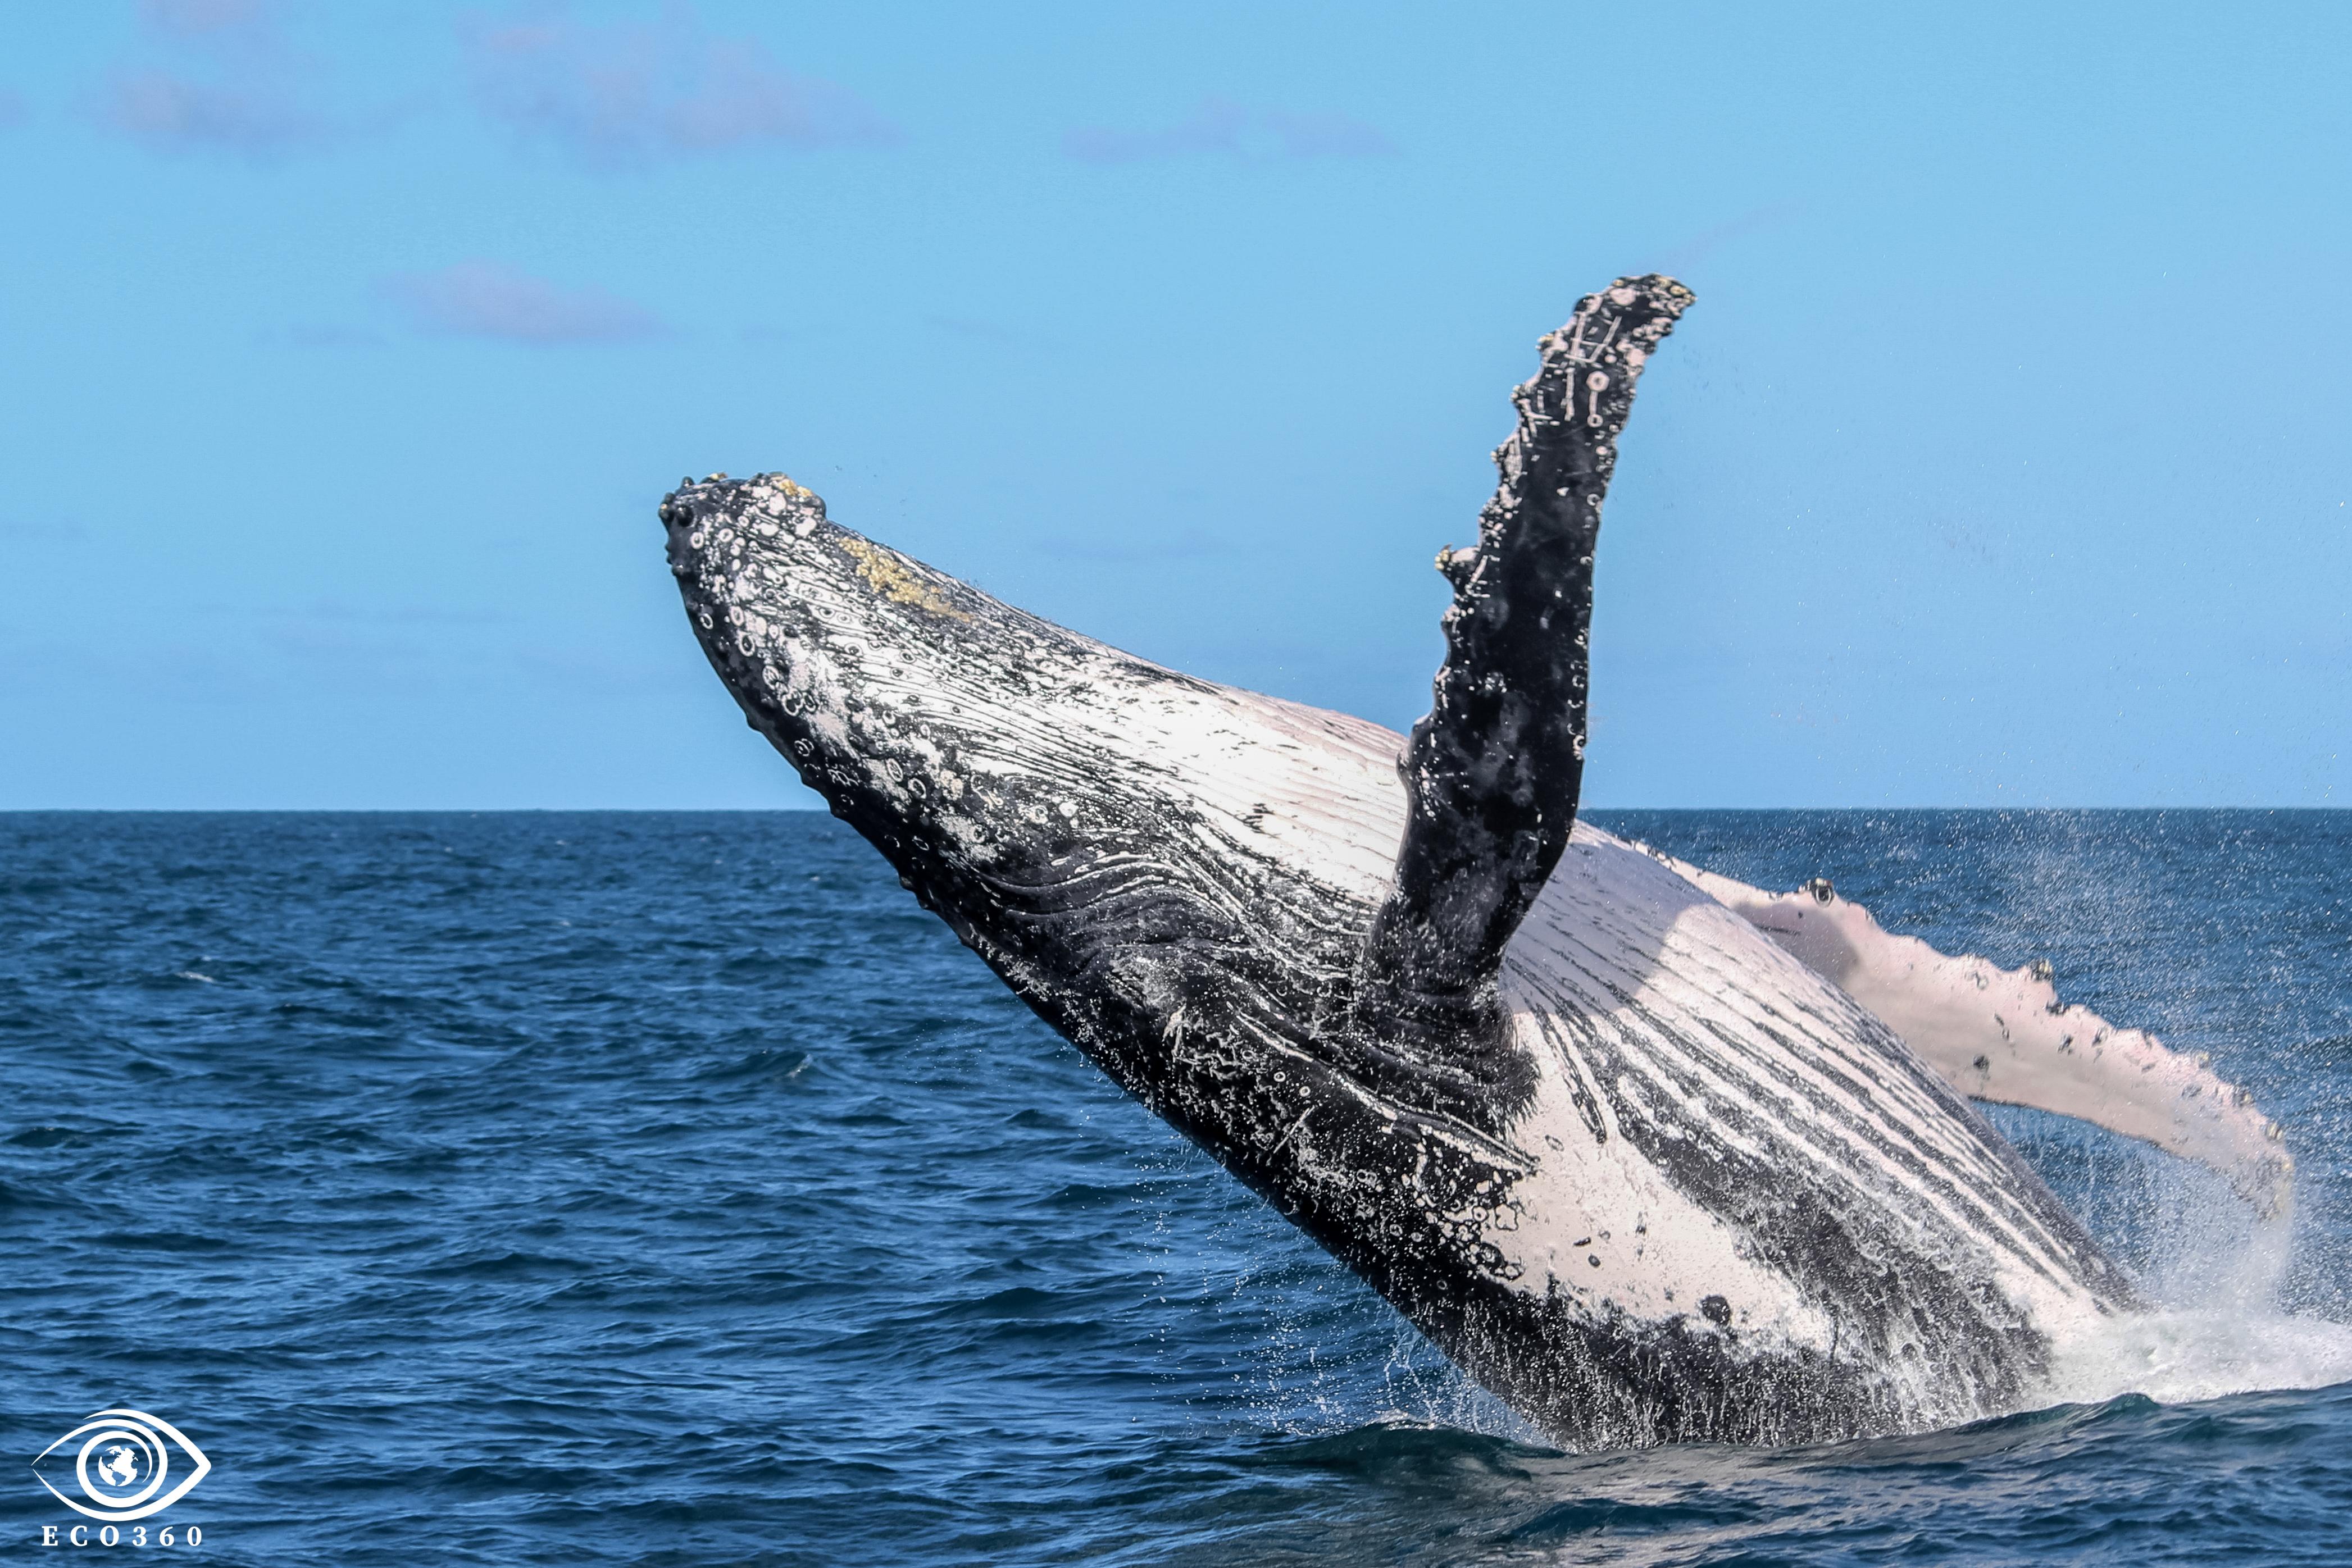 Baleia Jubarte / Humpback Whale / <i>Megaptera novaeangliae<i>